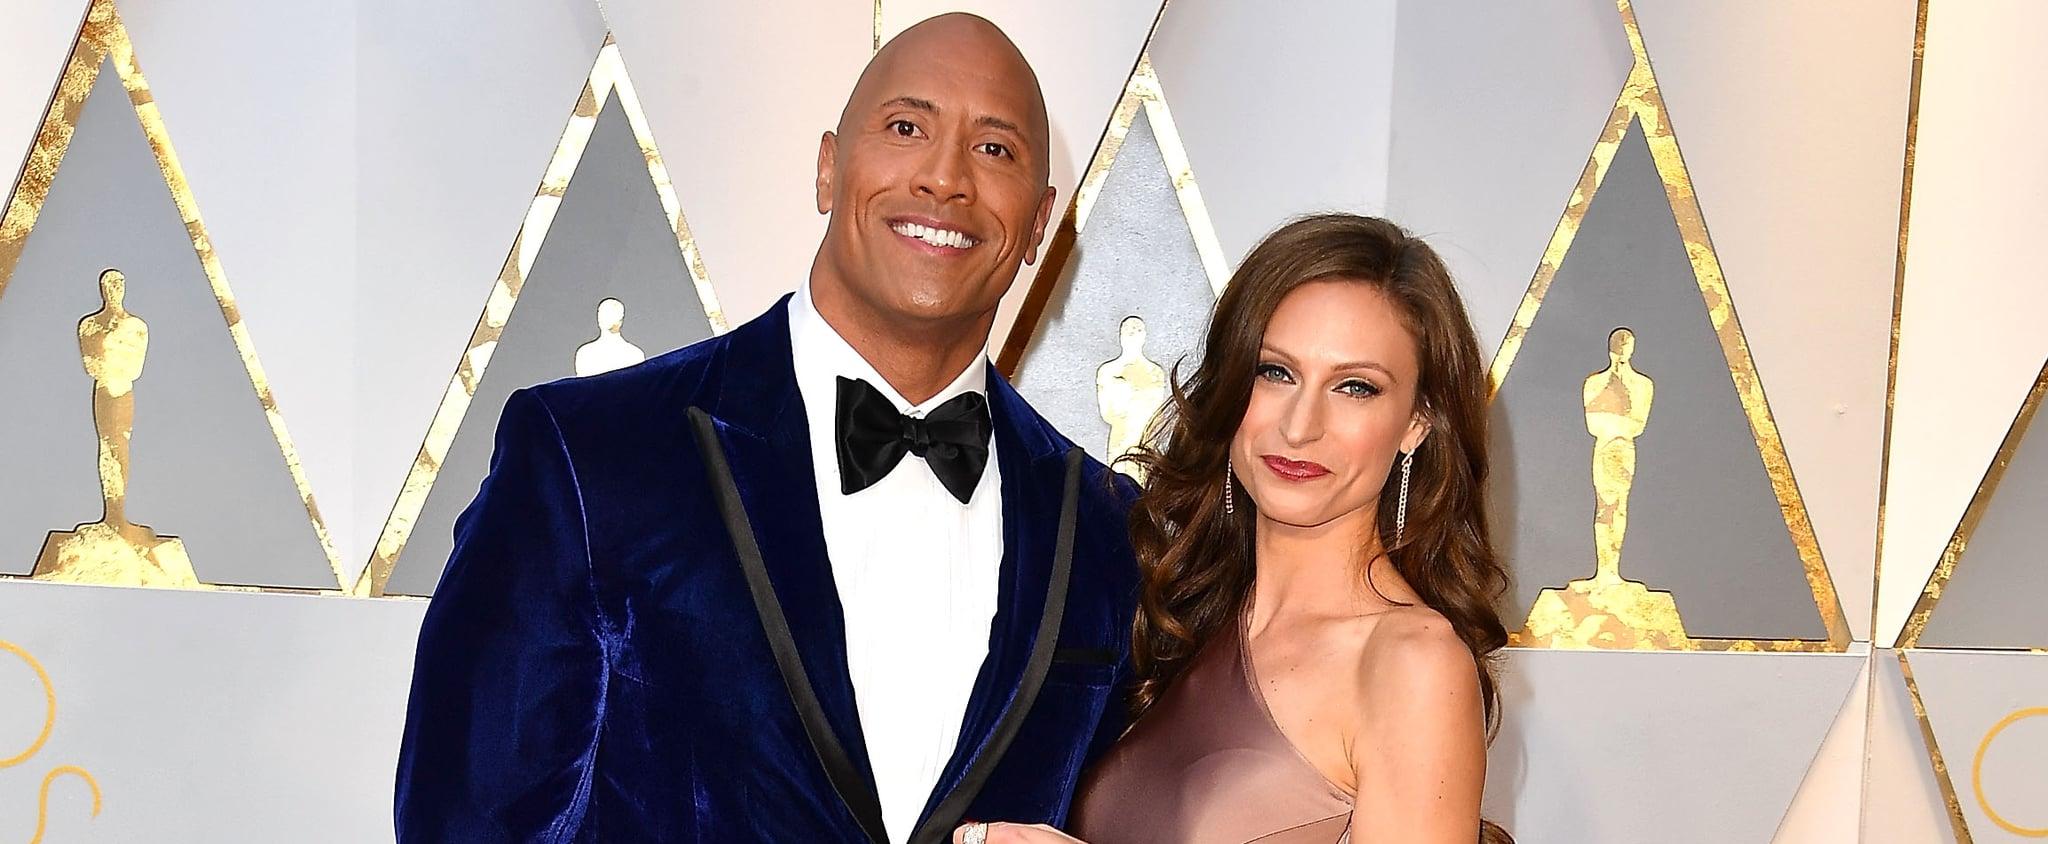 Dwayne Johnson and Lauren Hashian Married